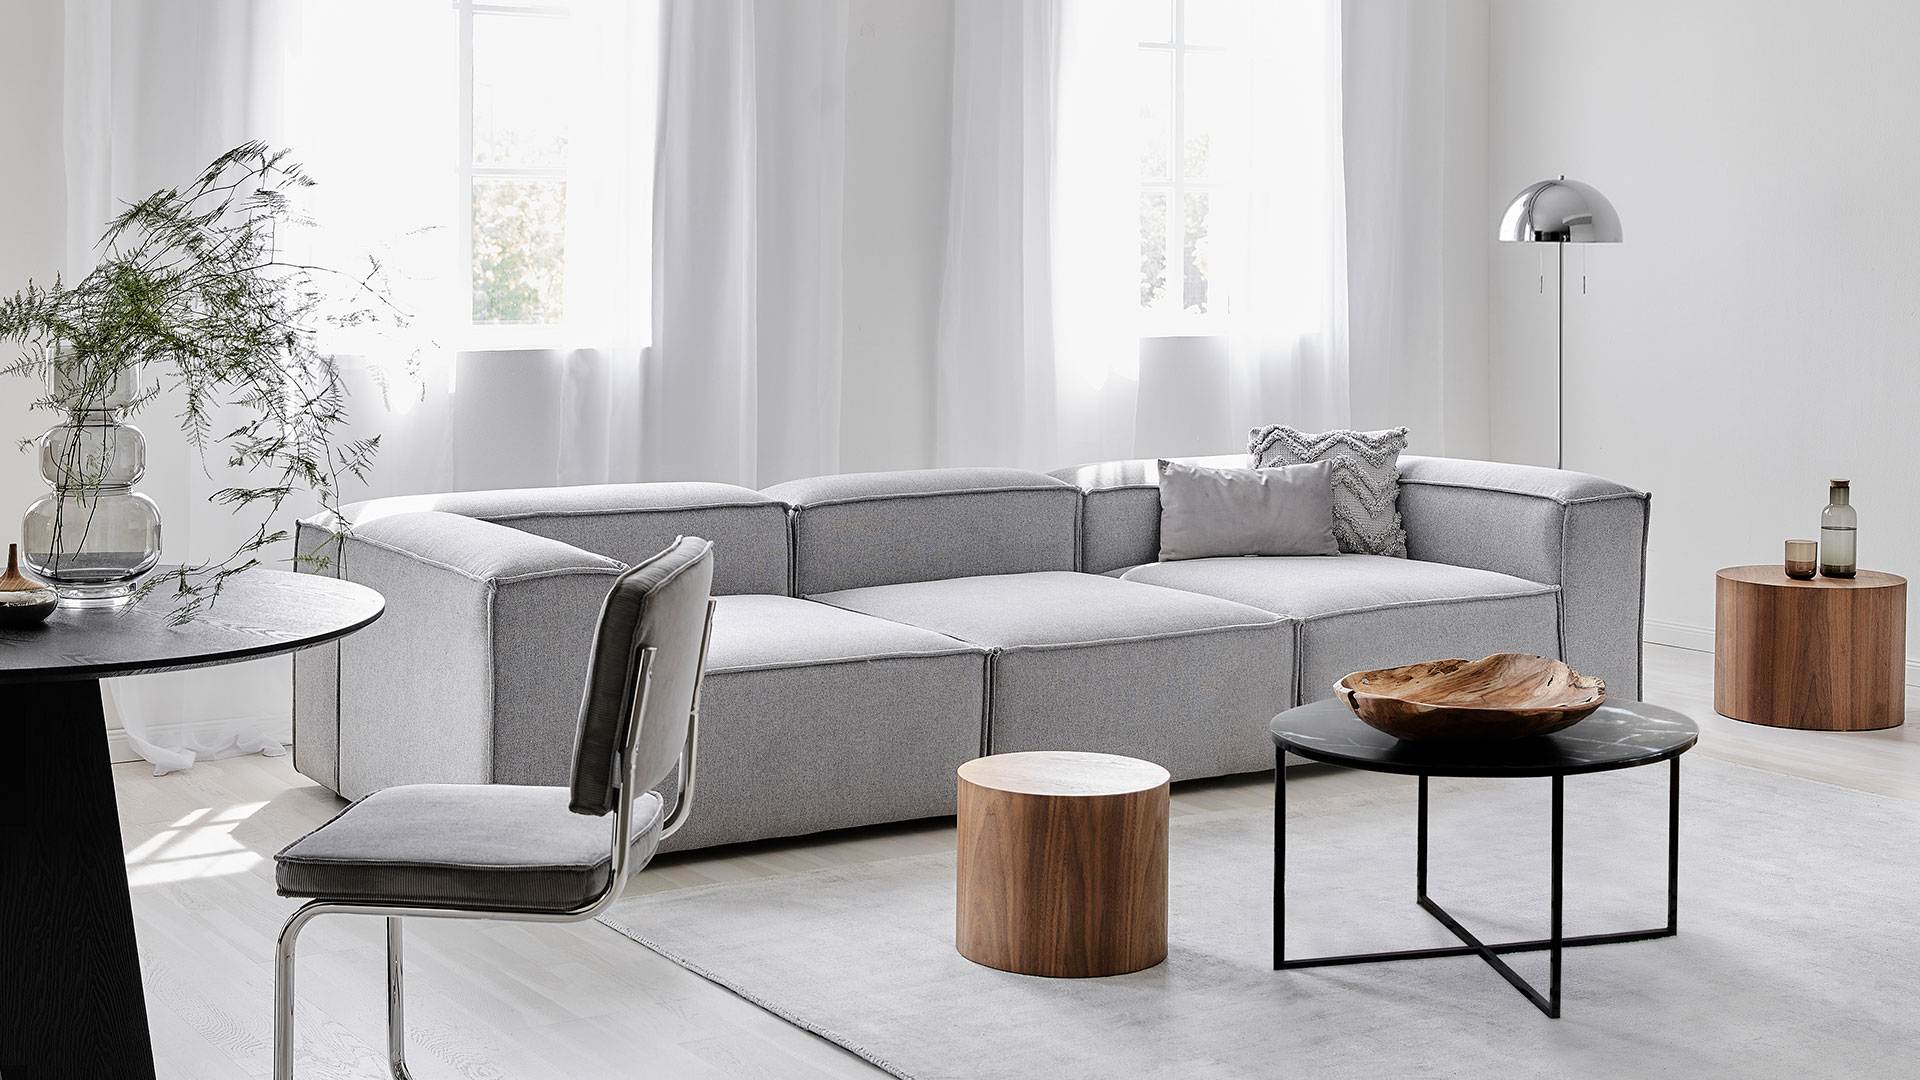 Sofa Lennon: szara